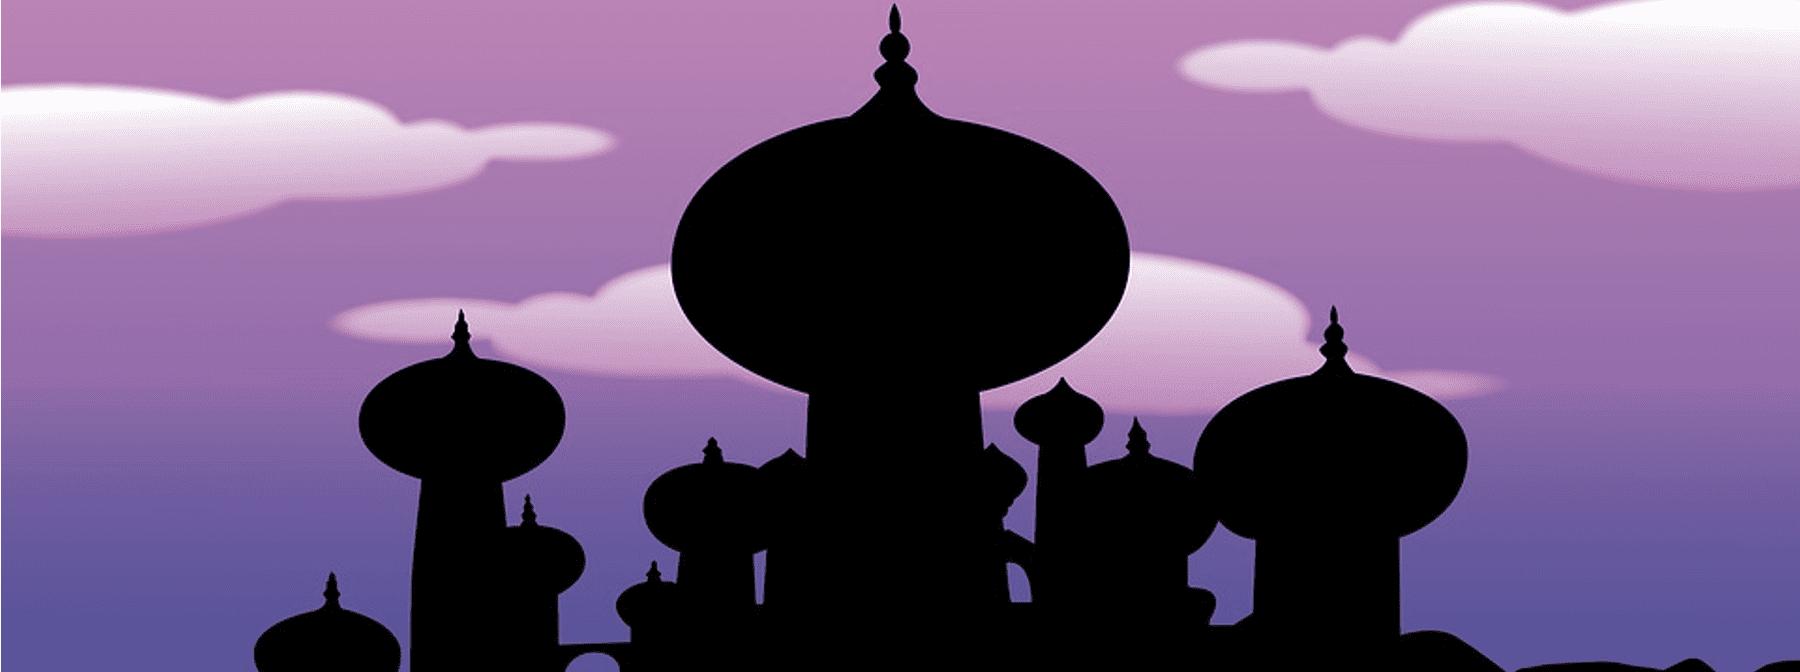 Aladdin: The New Aladdin Trailer (2019) is Here!